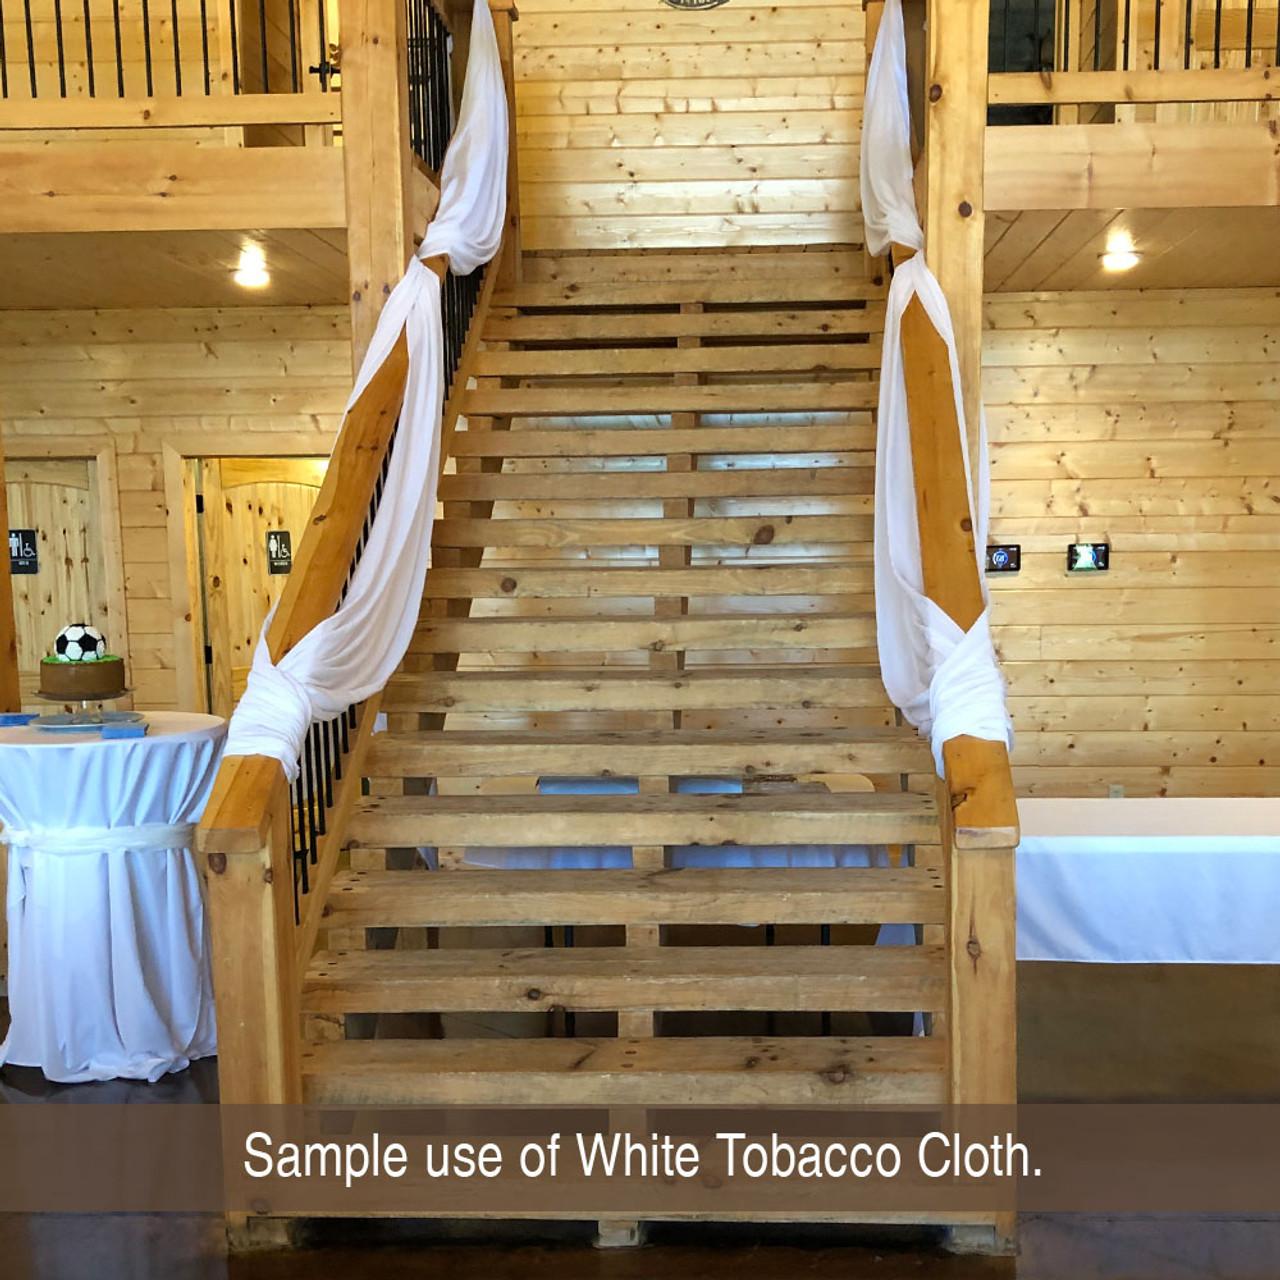 White Tobacco Cloth Cotton Fabric - Lightweight